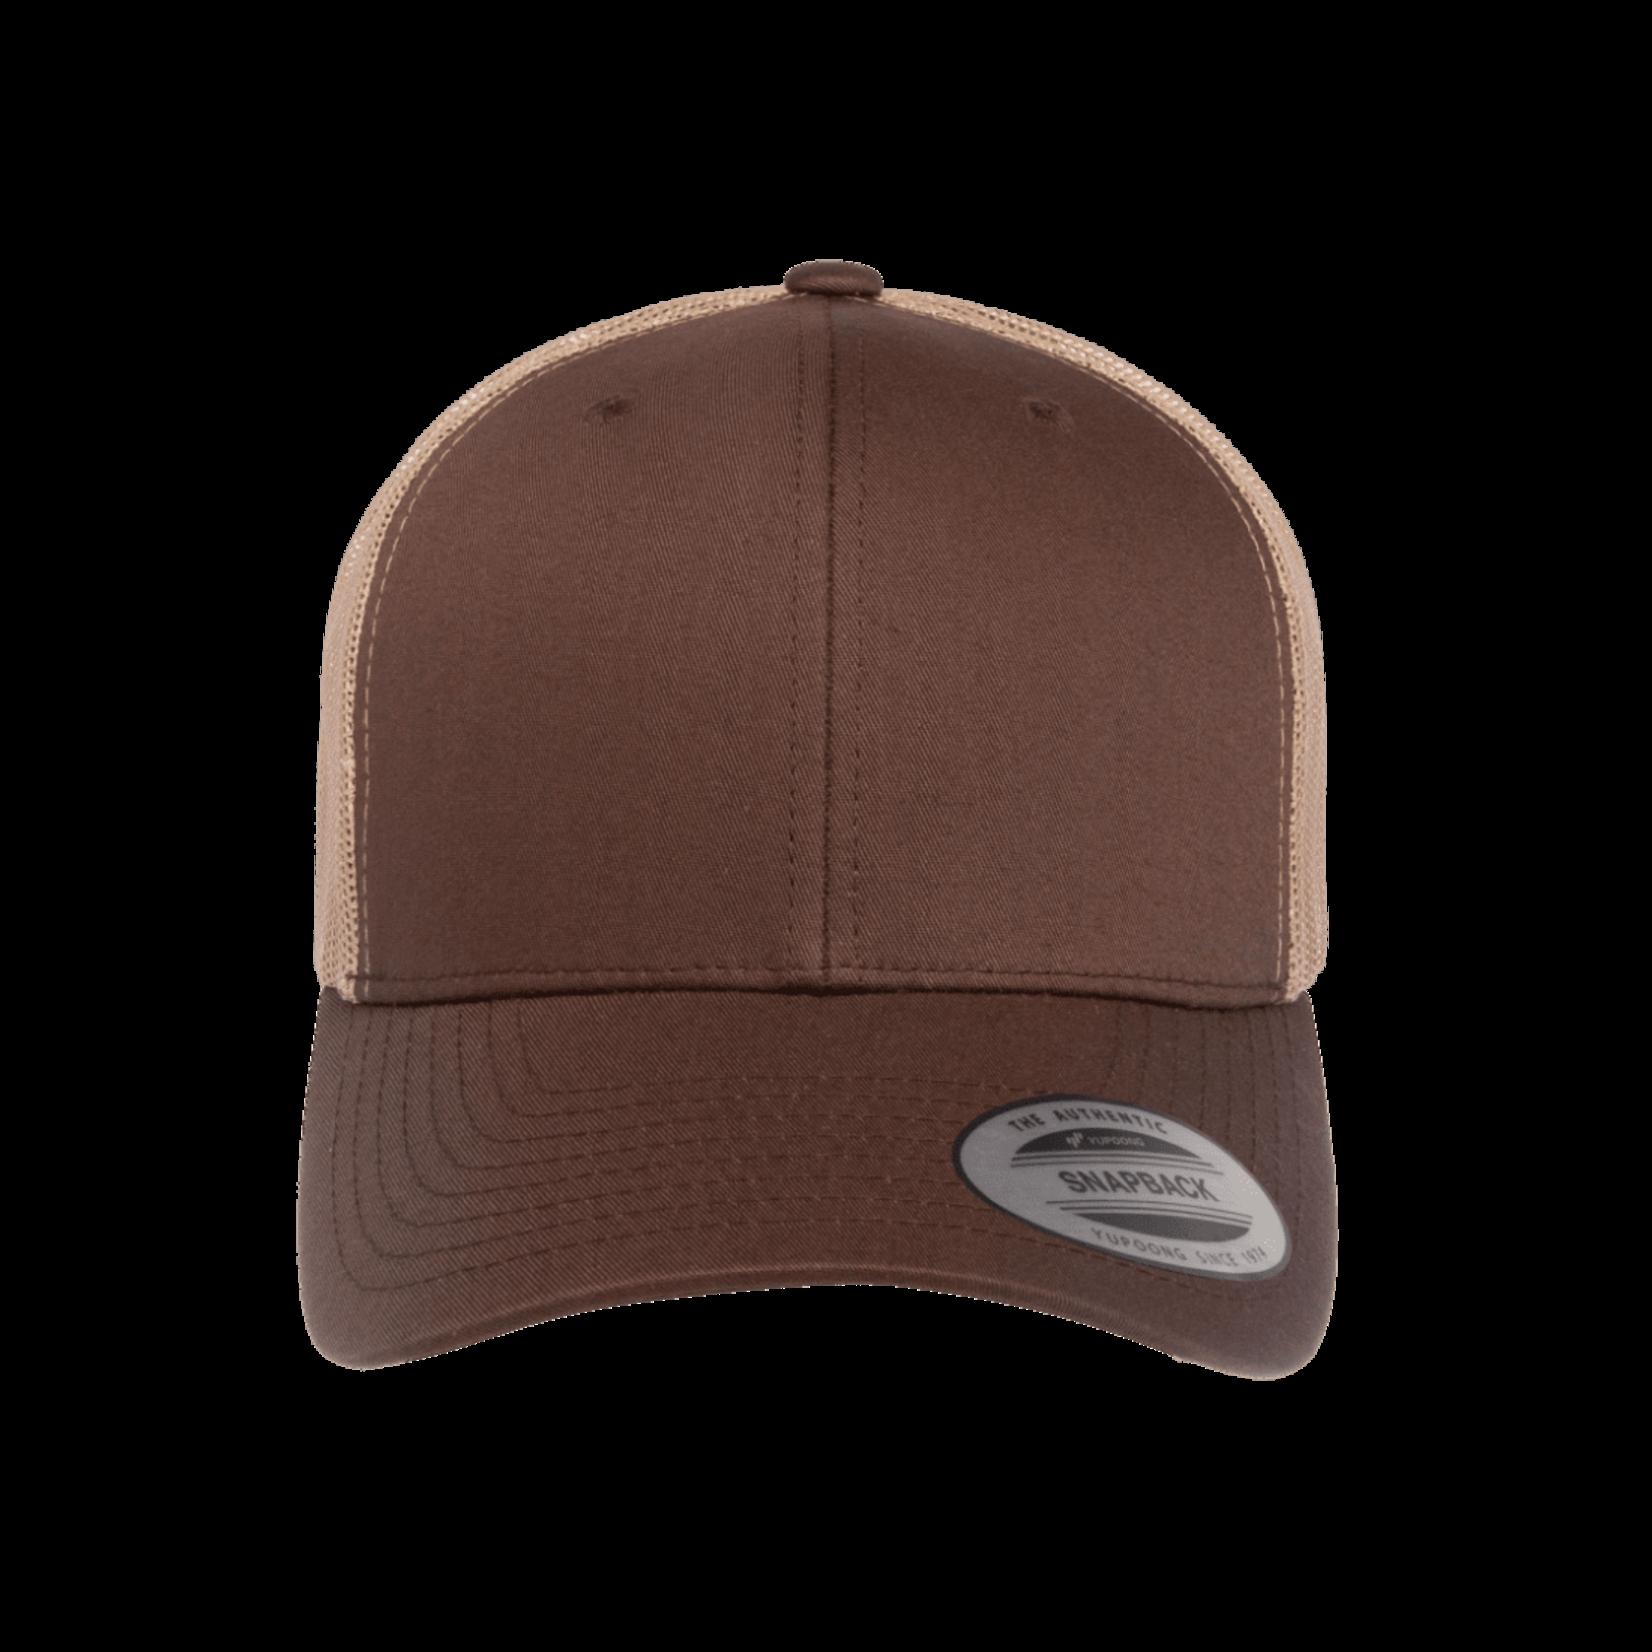 Flexfit Flexfit 6606T 2-Tone Snapback Trucker Hat - Brown/Khaki